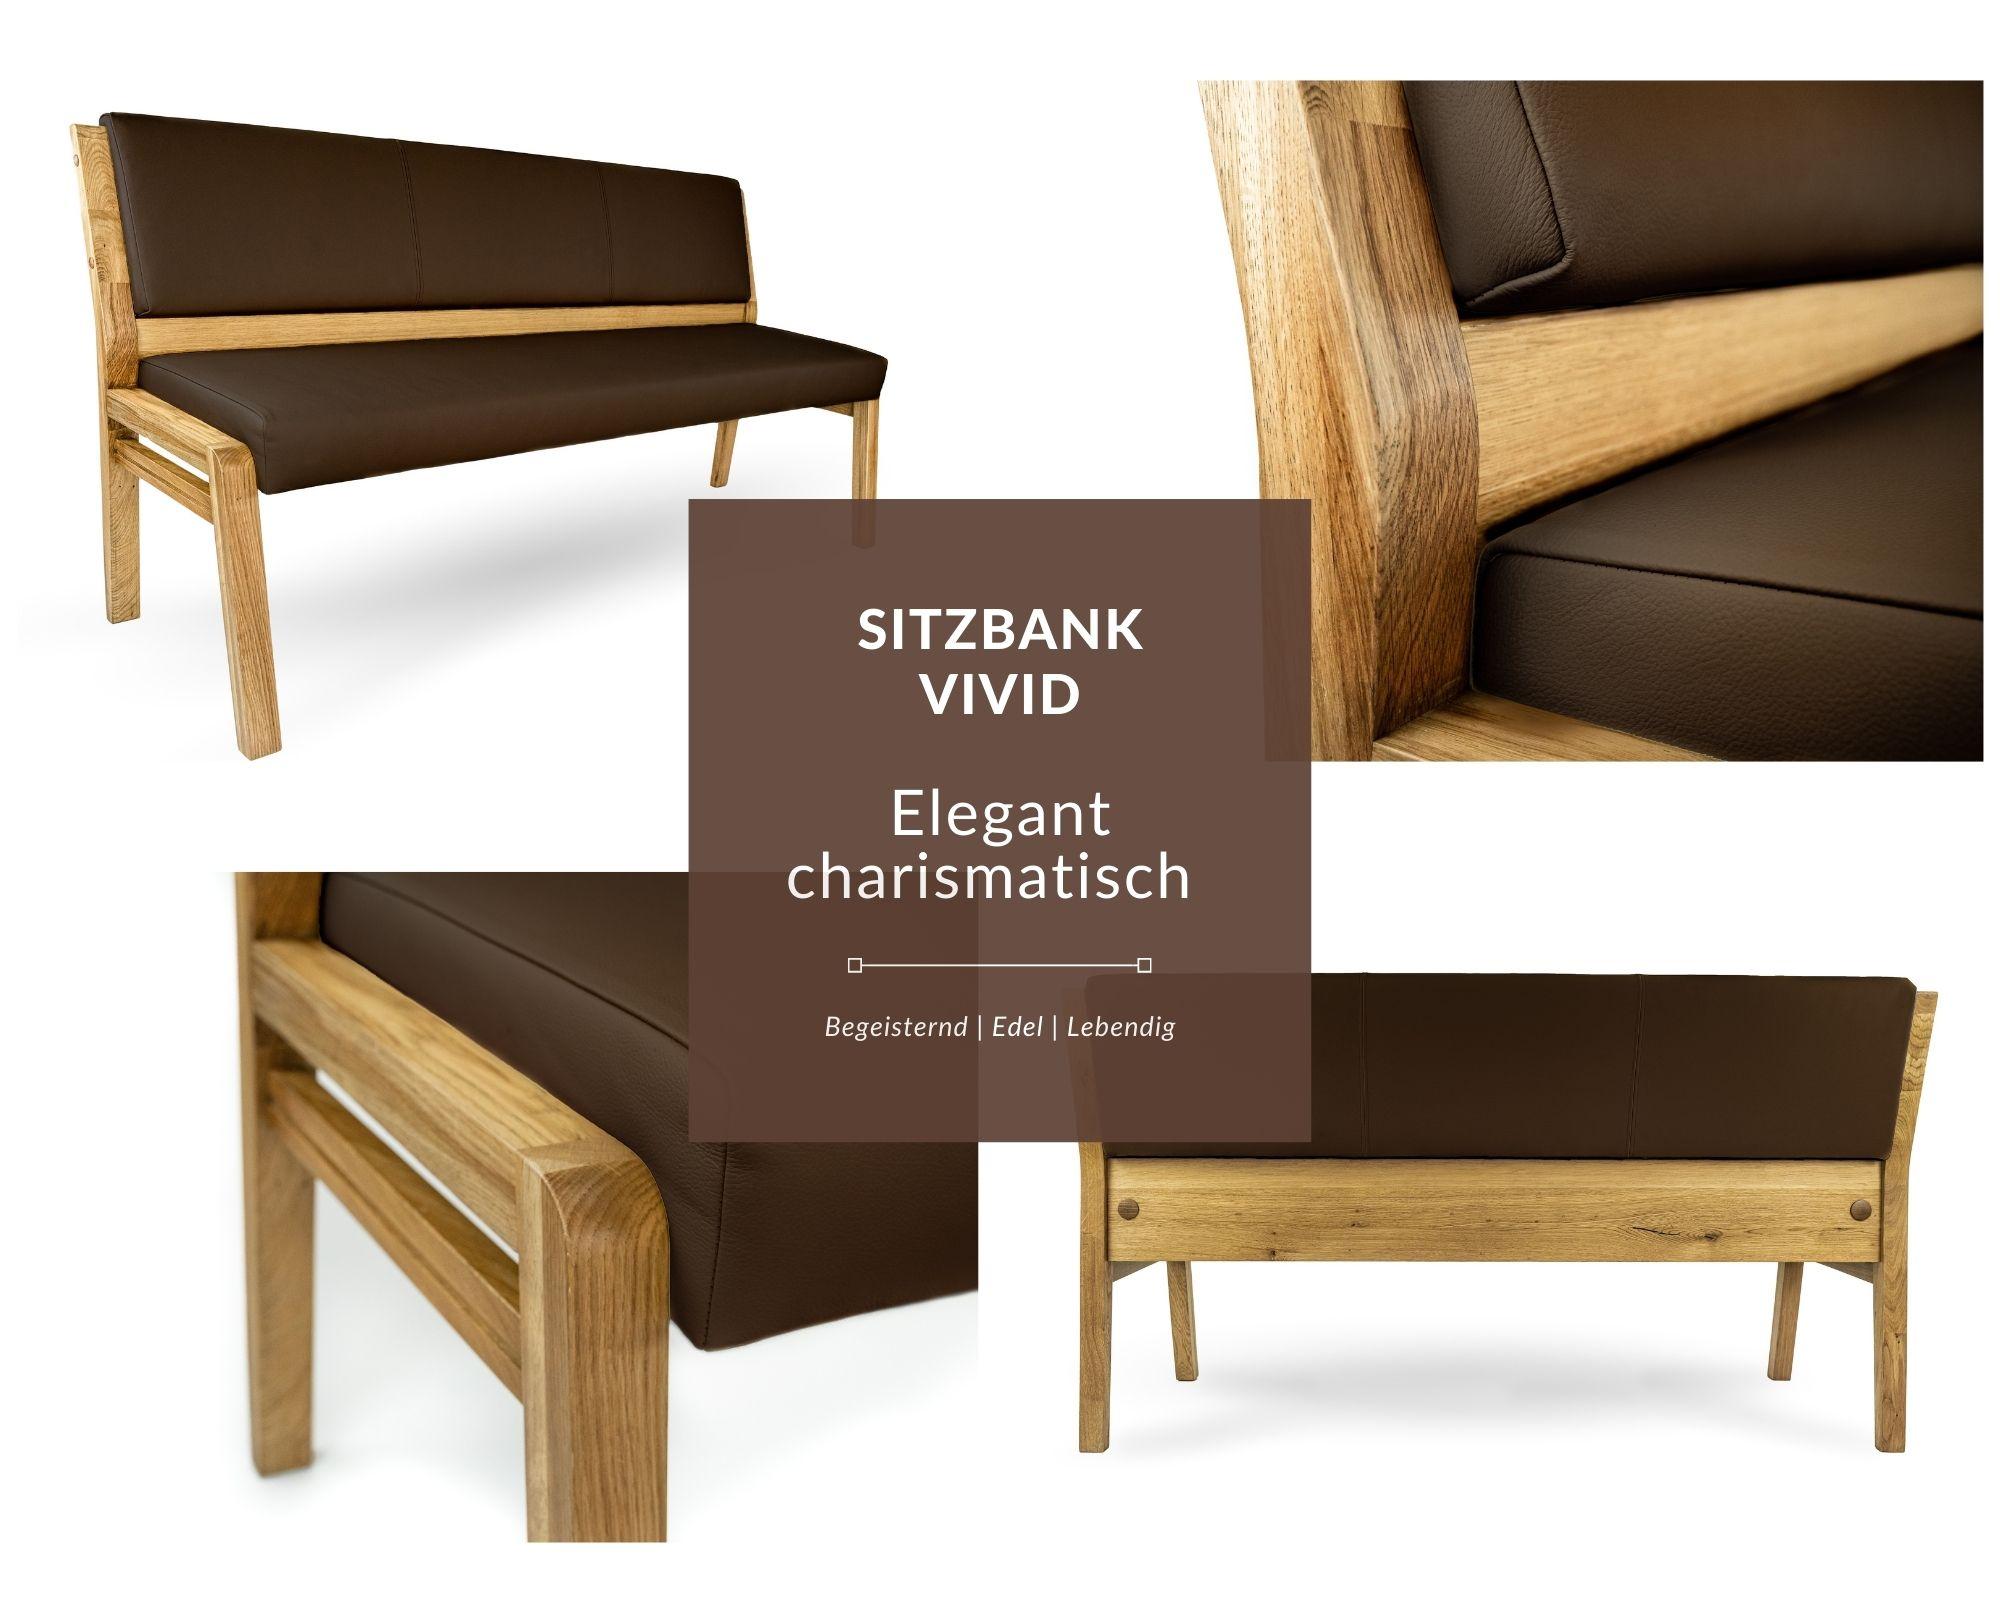 sitzbank modern aus massivholz mit echtleder polster